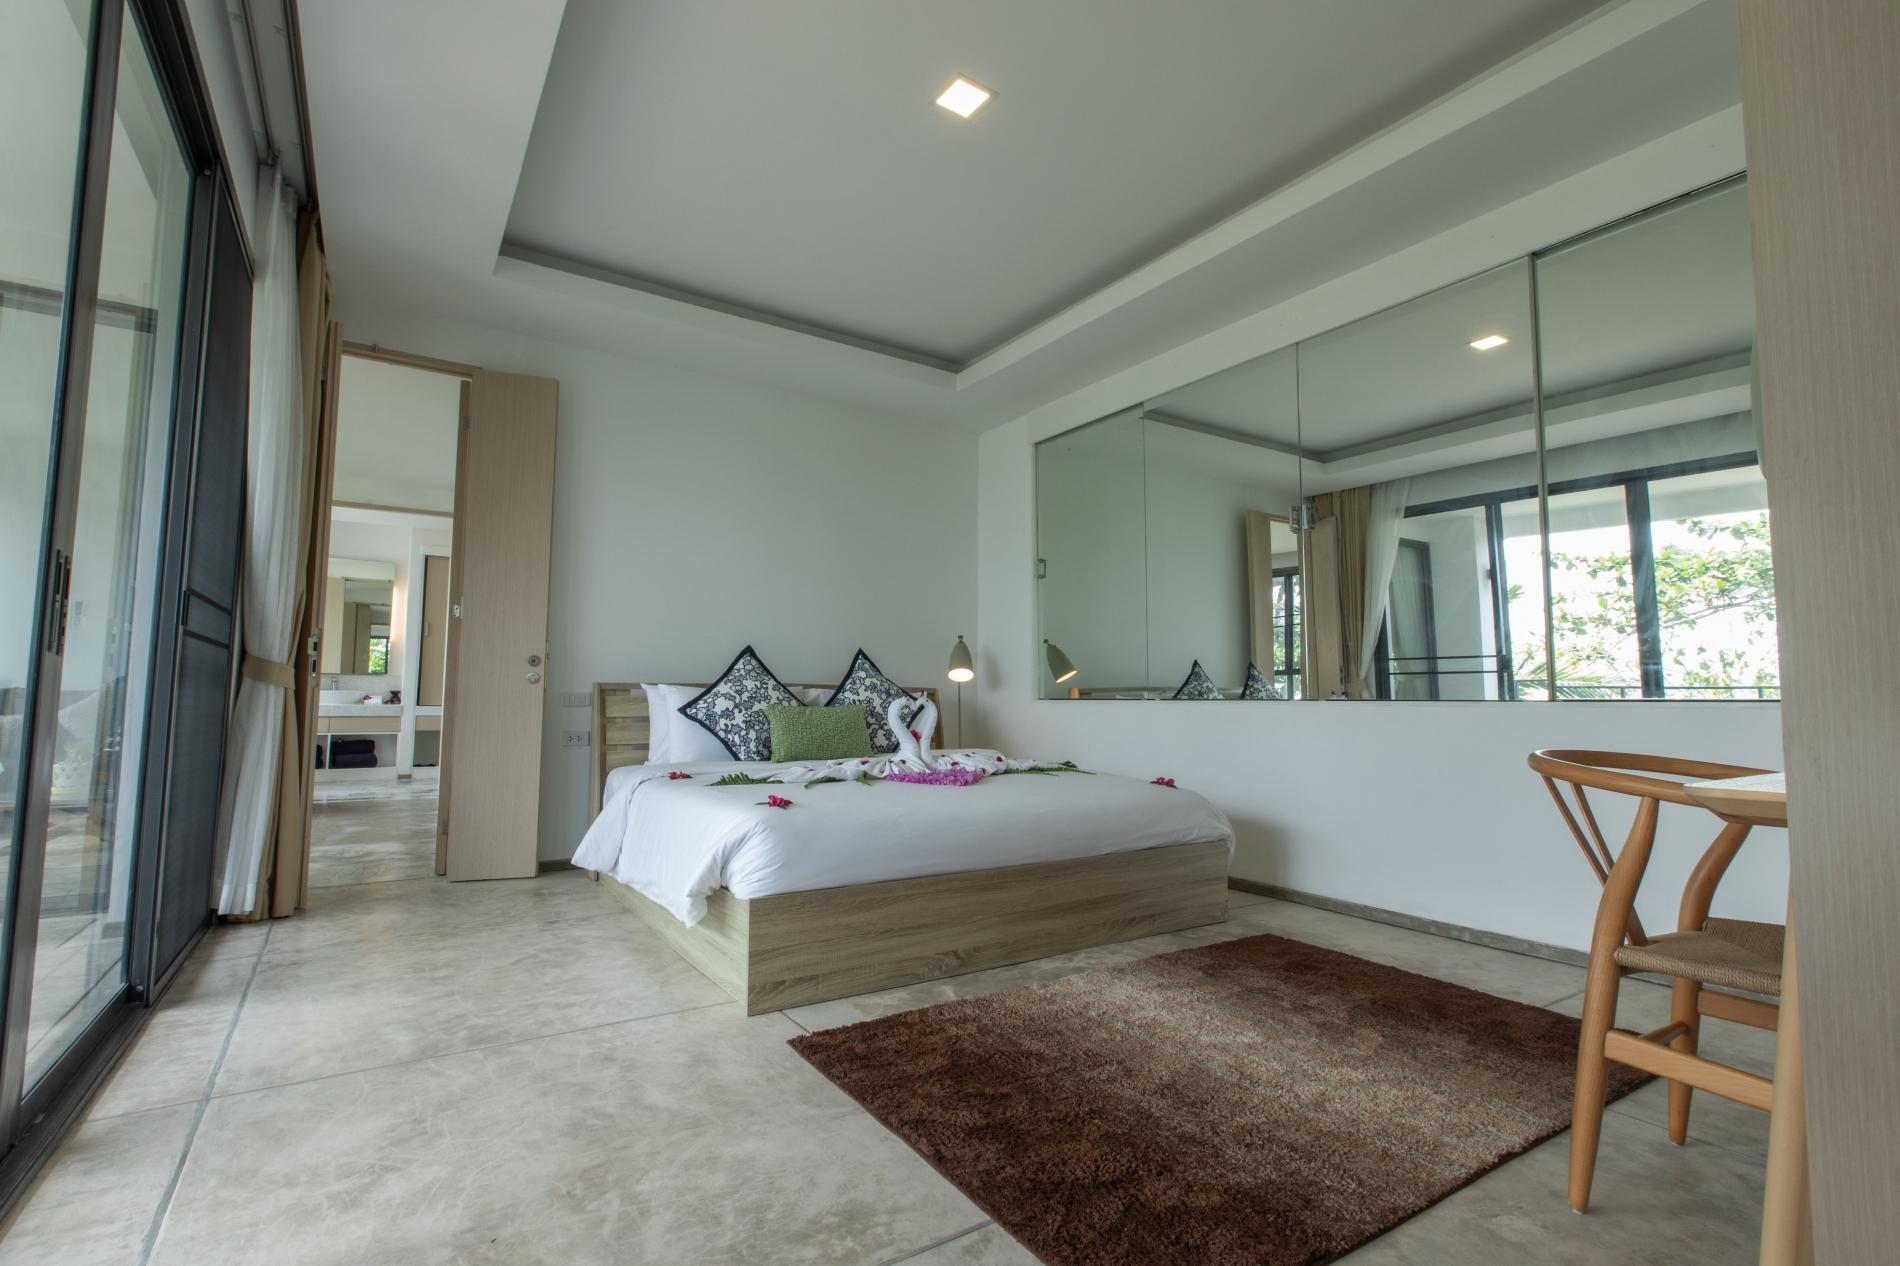 Apartment Beachfront and seaview apartment for 4 on Kamala - KBE photo 18988704